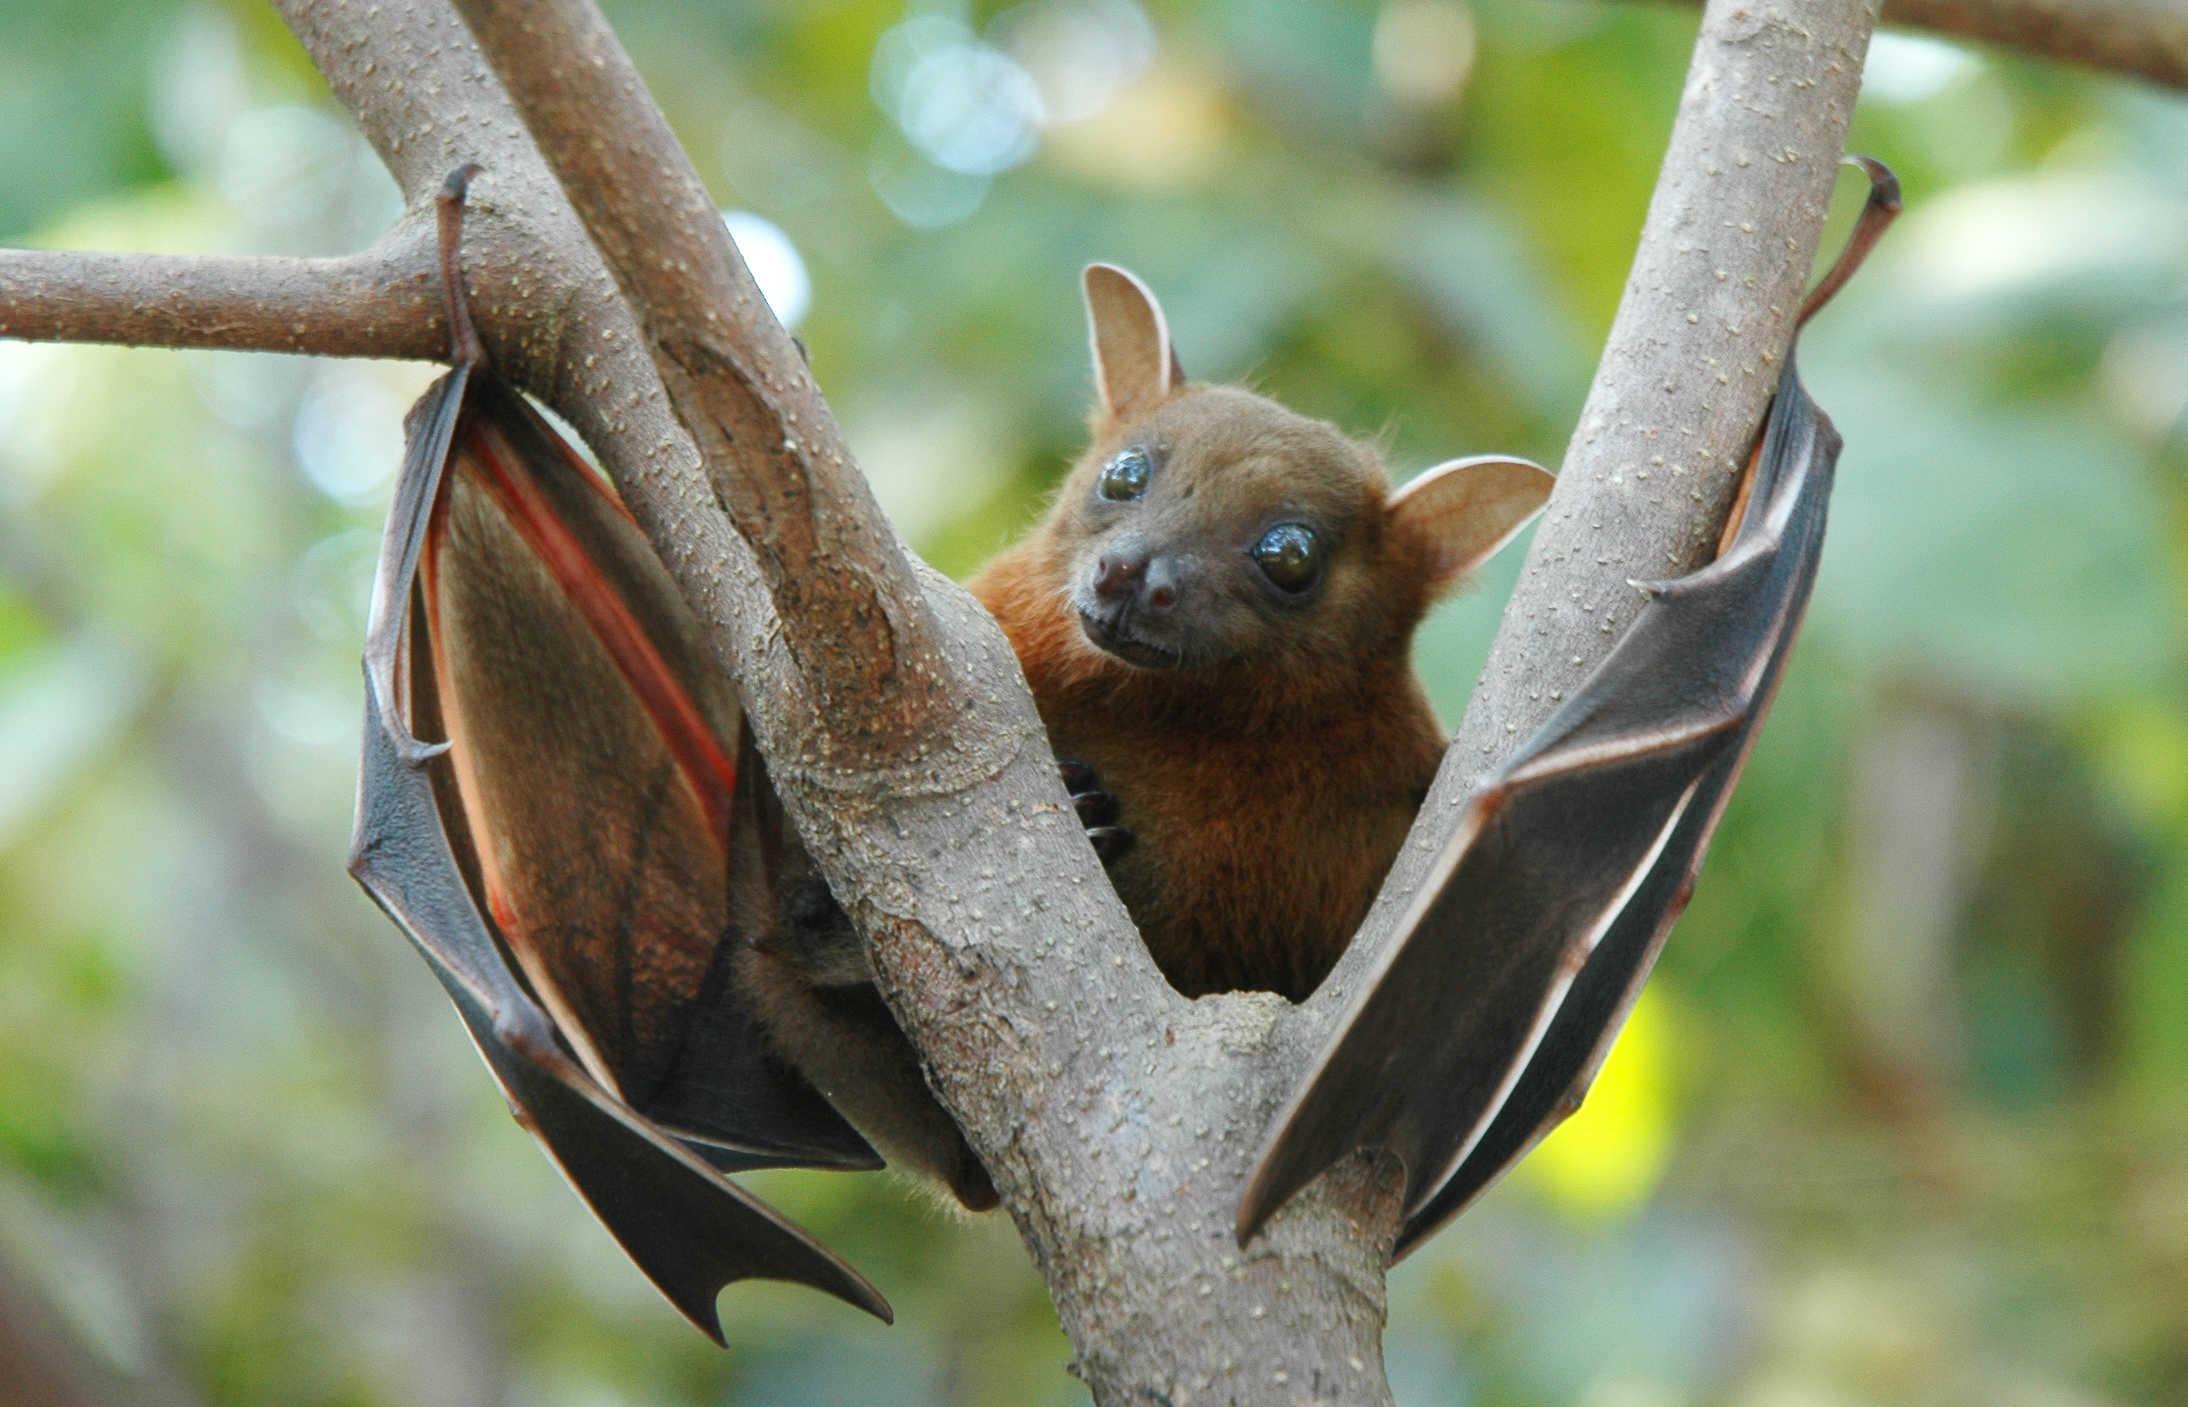 Not an Irish bat, but cute anyway.